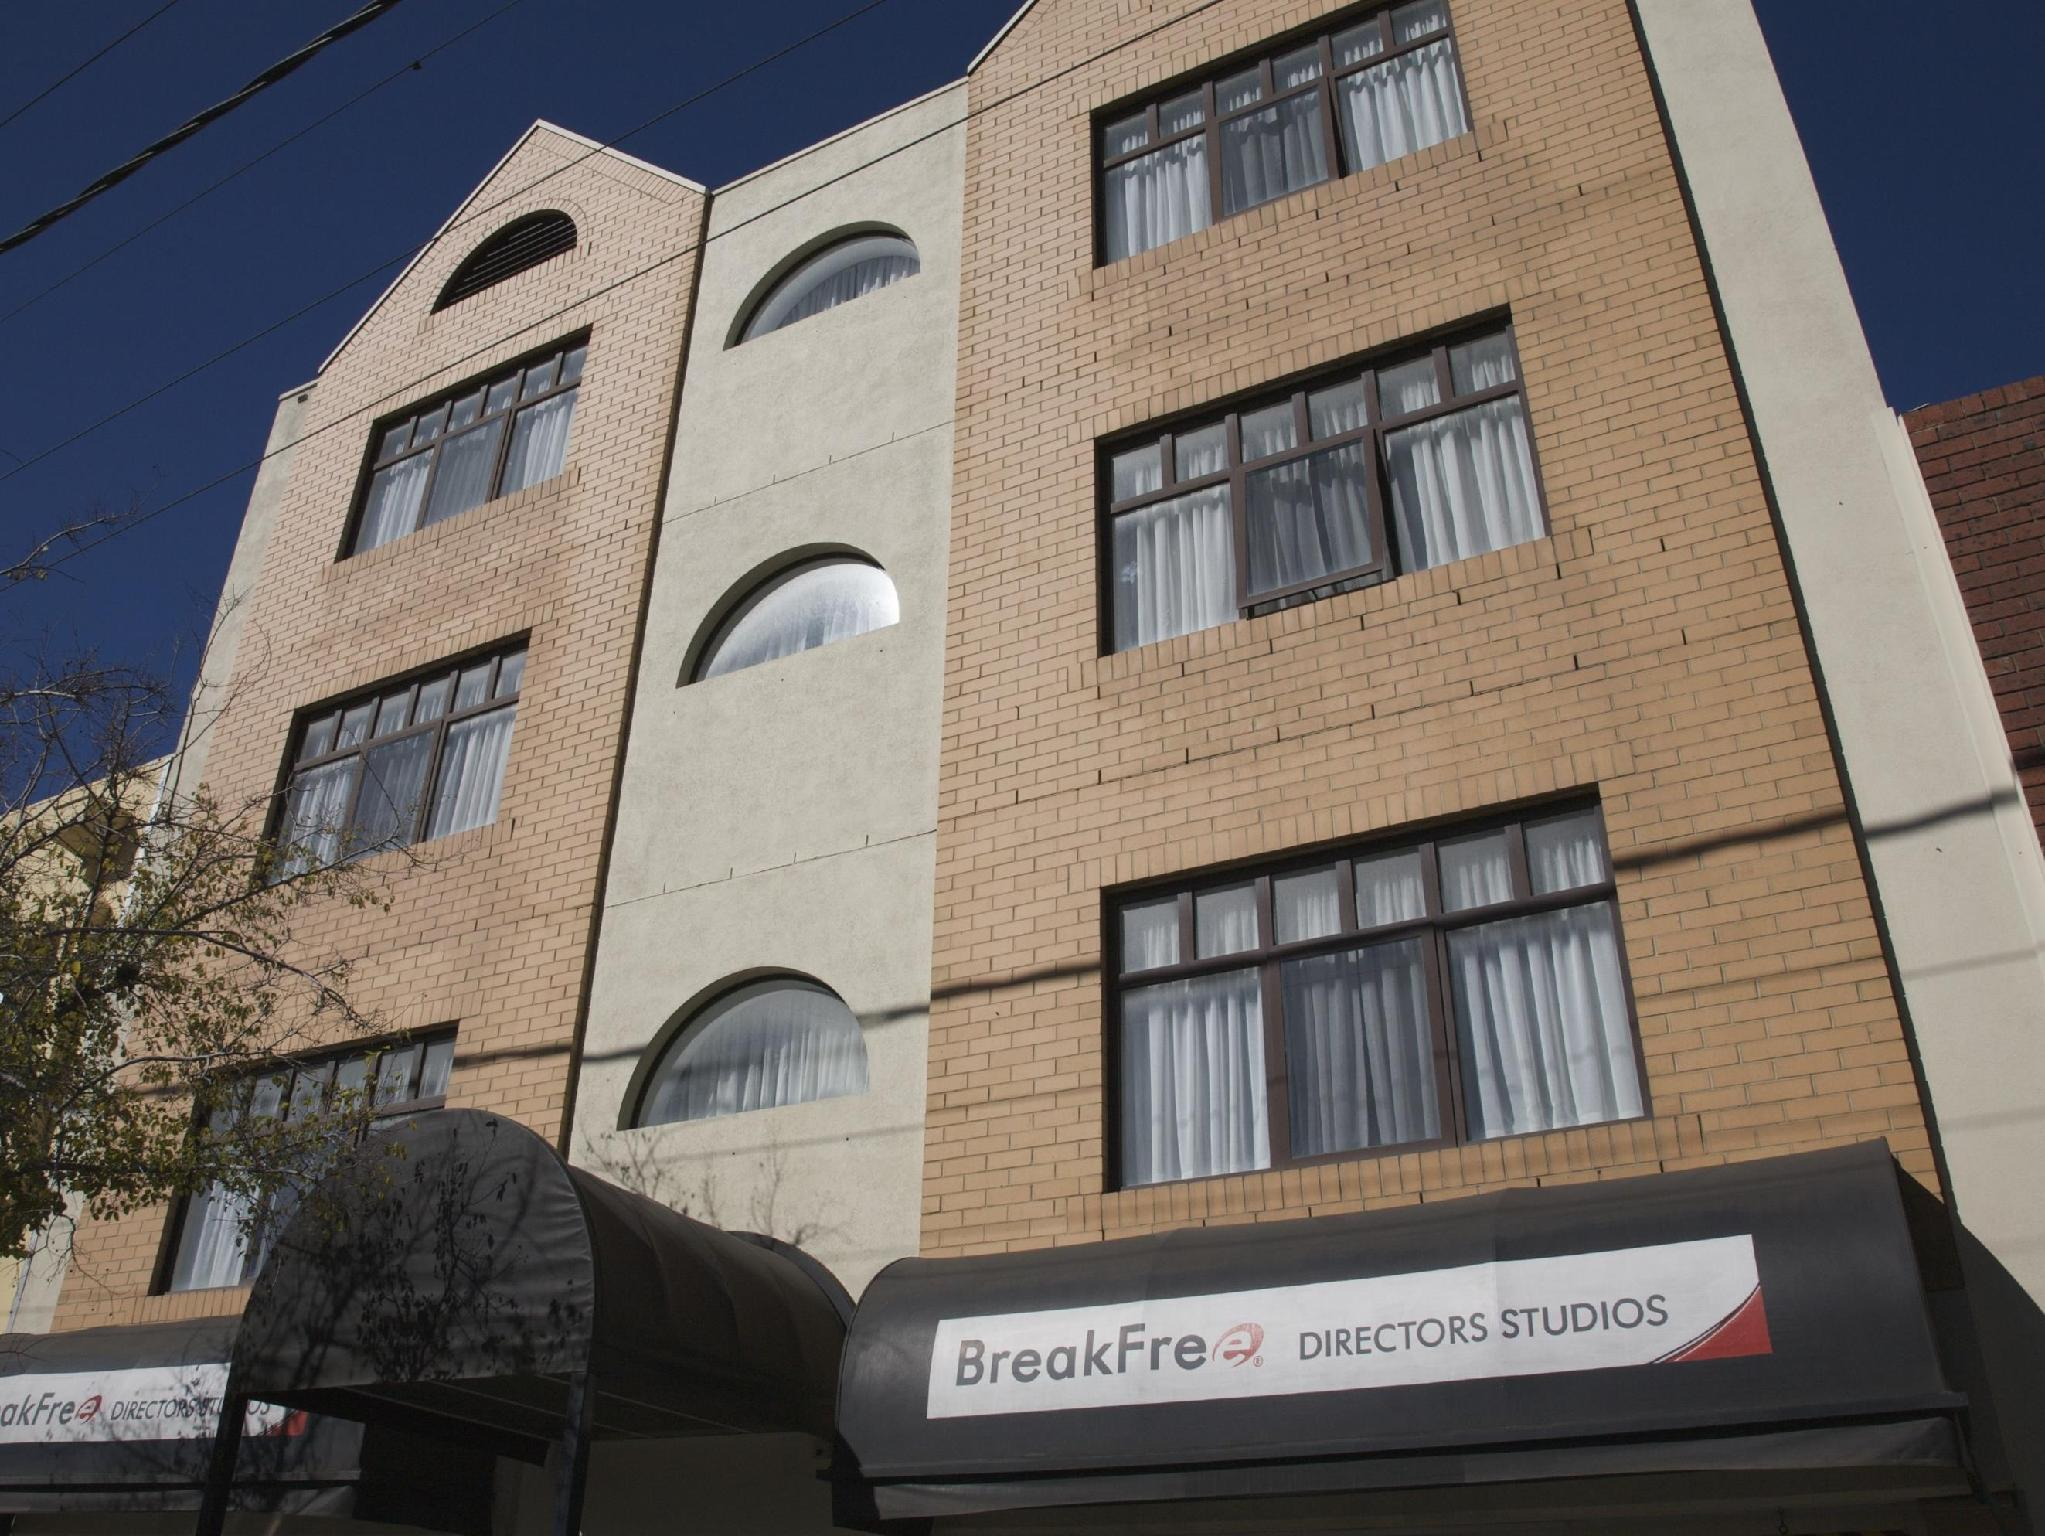 BreakFree Directors Studios Hotel Reviews